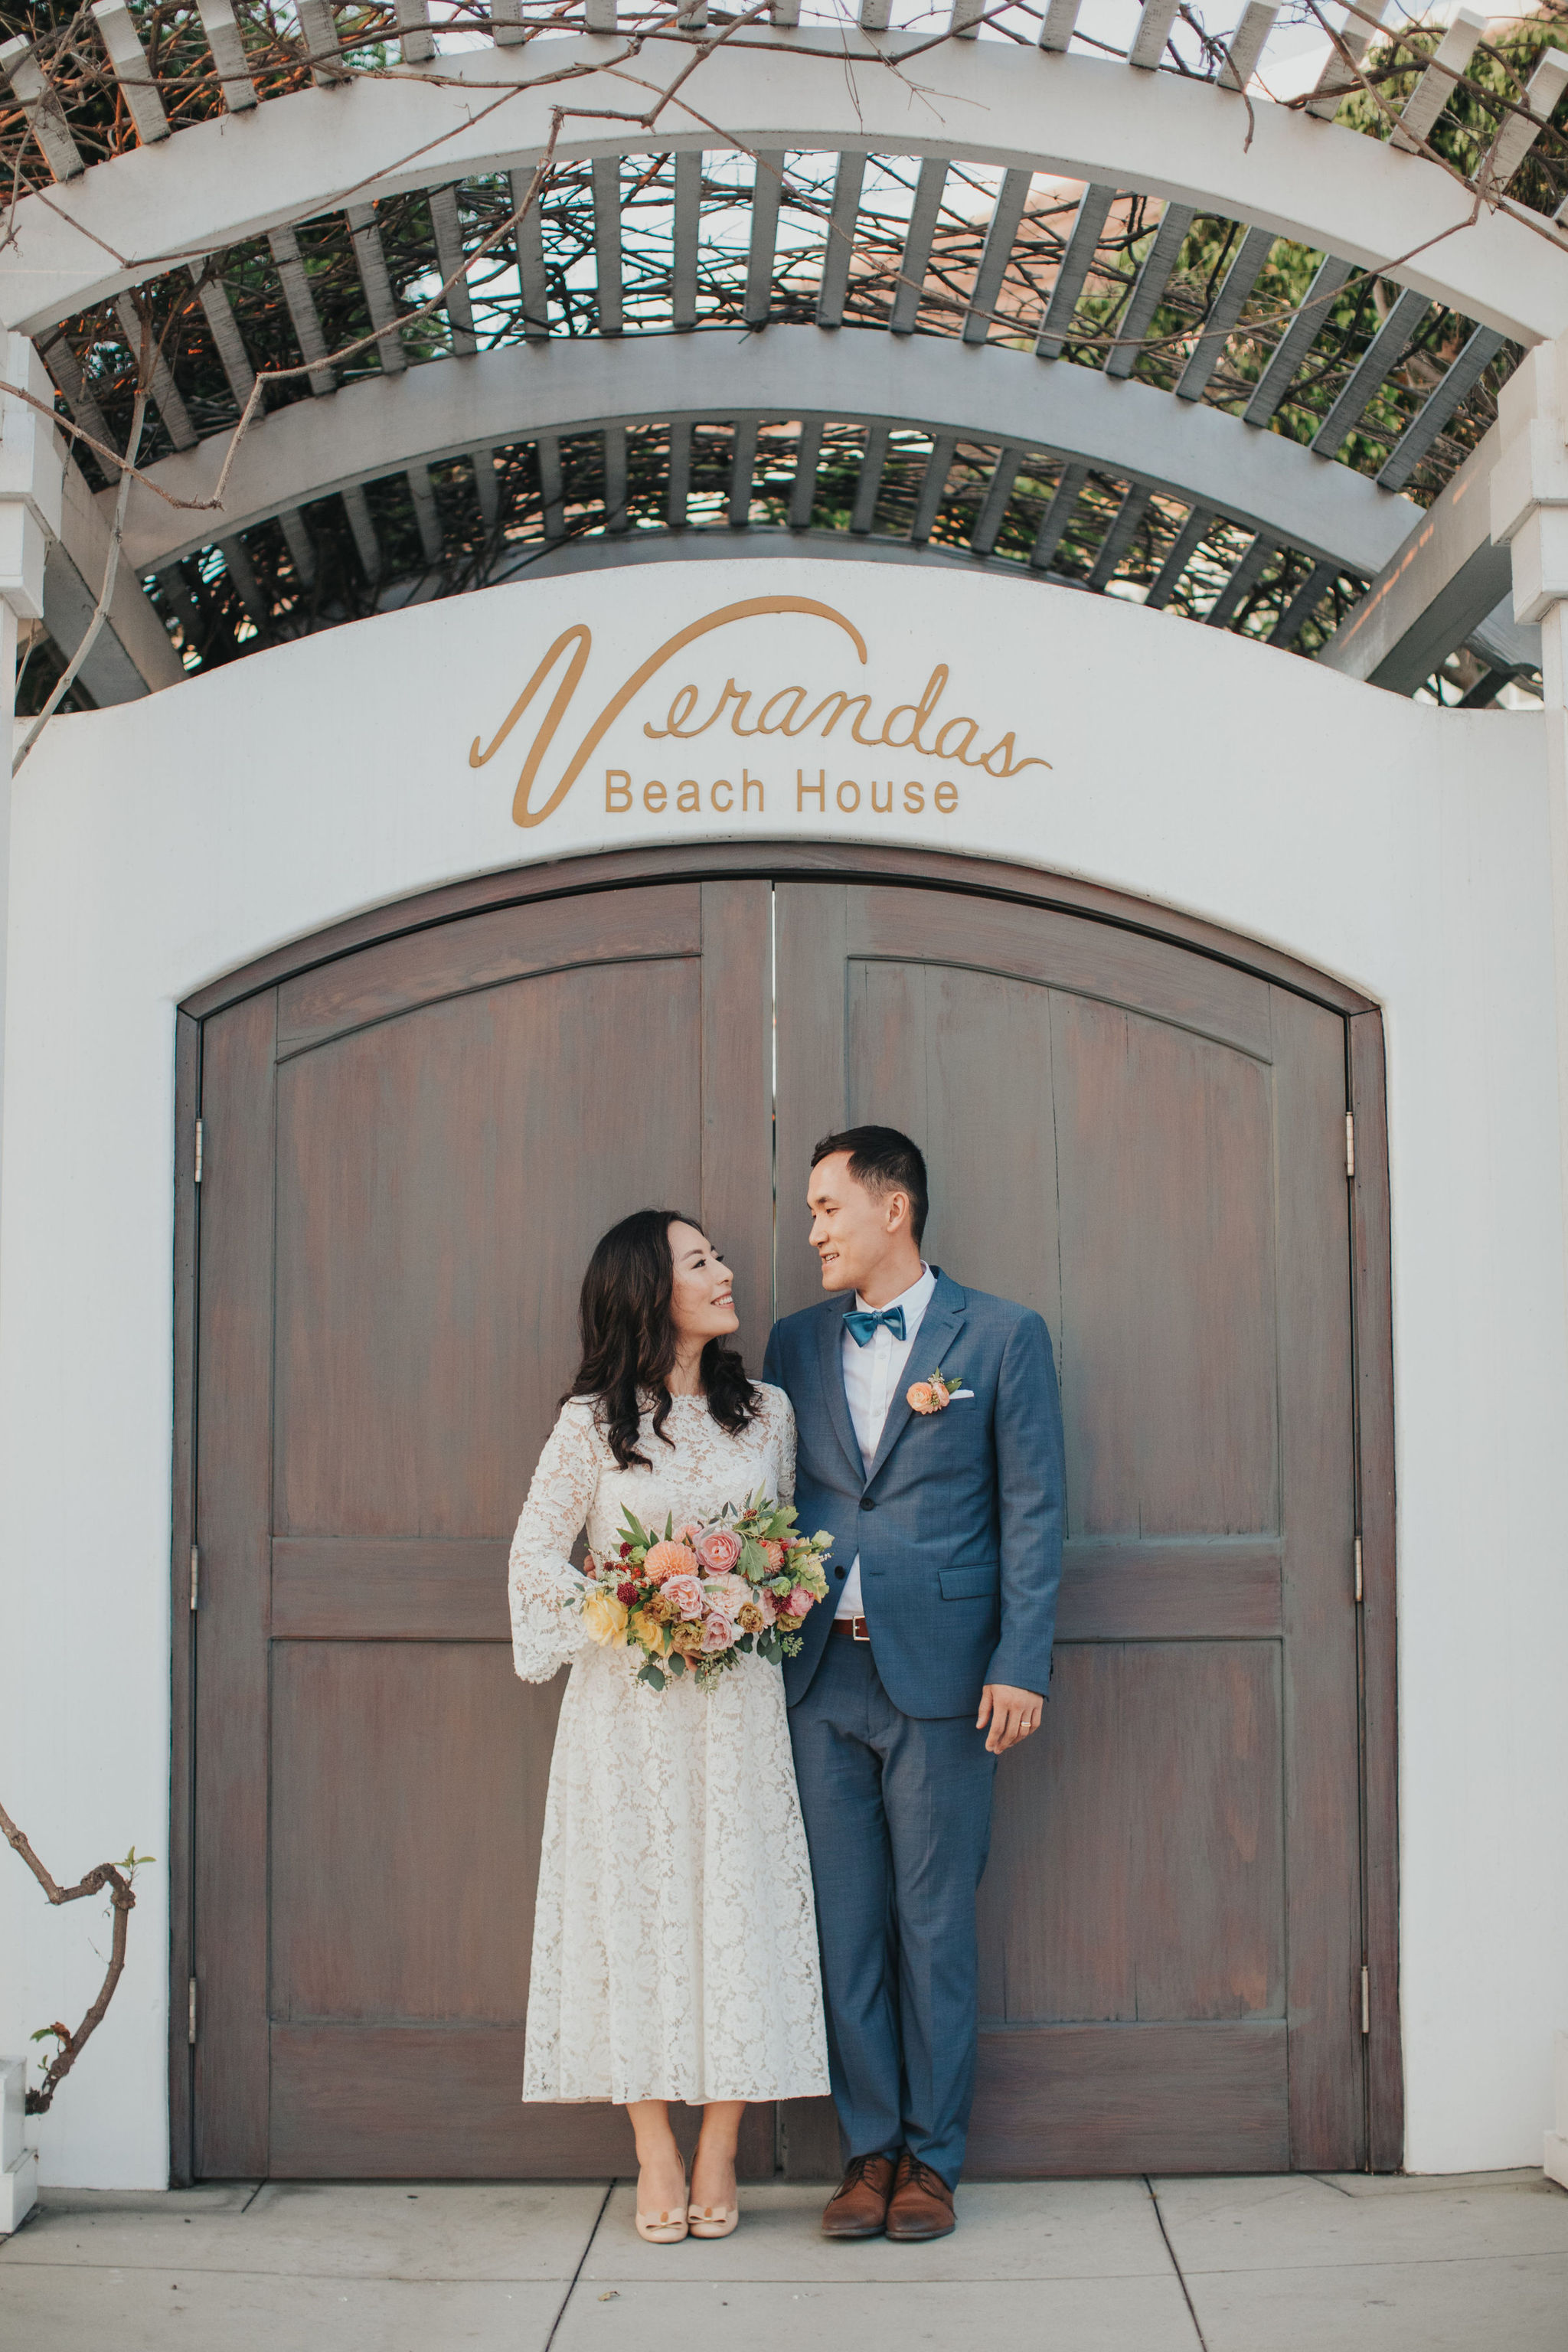 Verandas Doors | Verandas Beach House